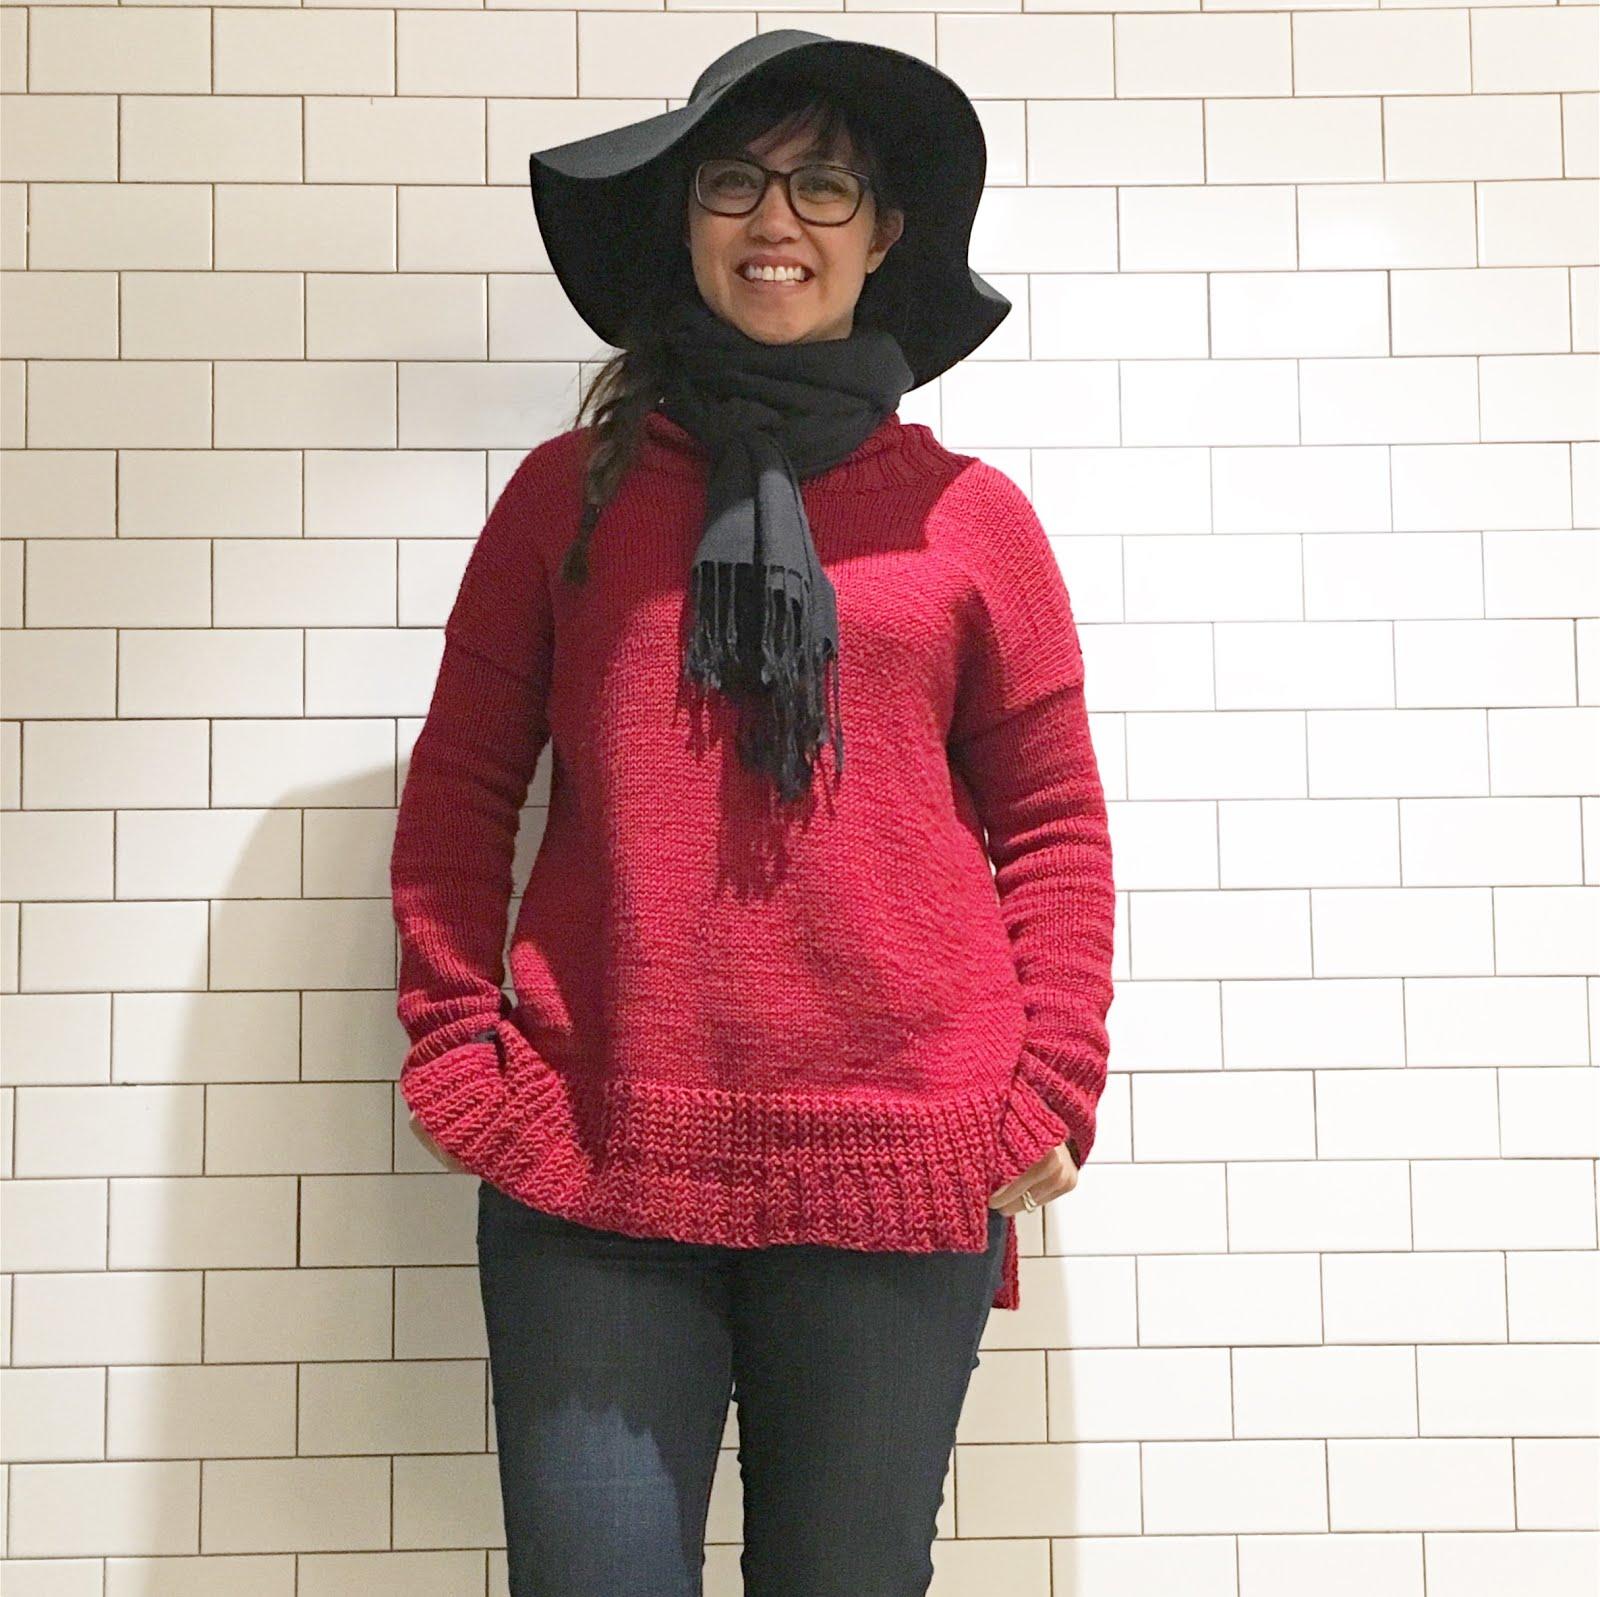 11cdce8d224b Oliphant Kat  Anatomy of a Sweater Pattern  Inspiration